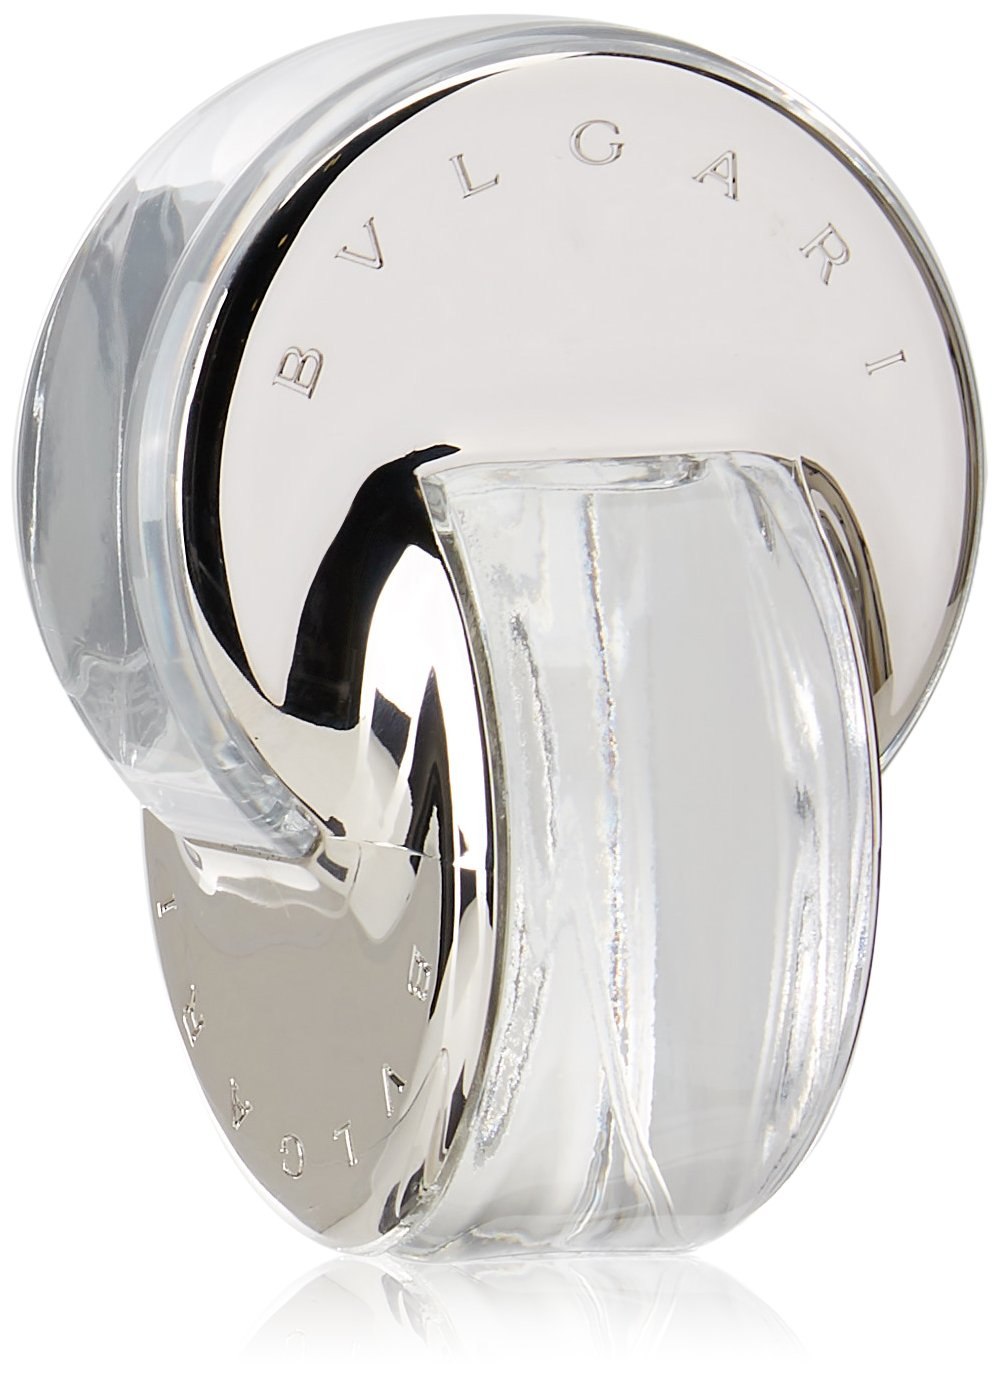 Bvlgari Omnia Crystalline for Women Eau De Toilette Spray, 2.2 fl oz by BVLGARI